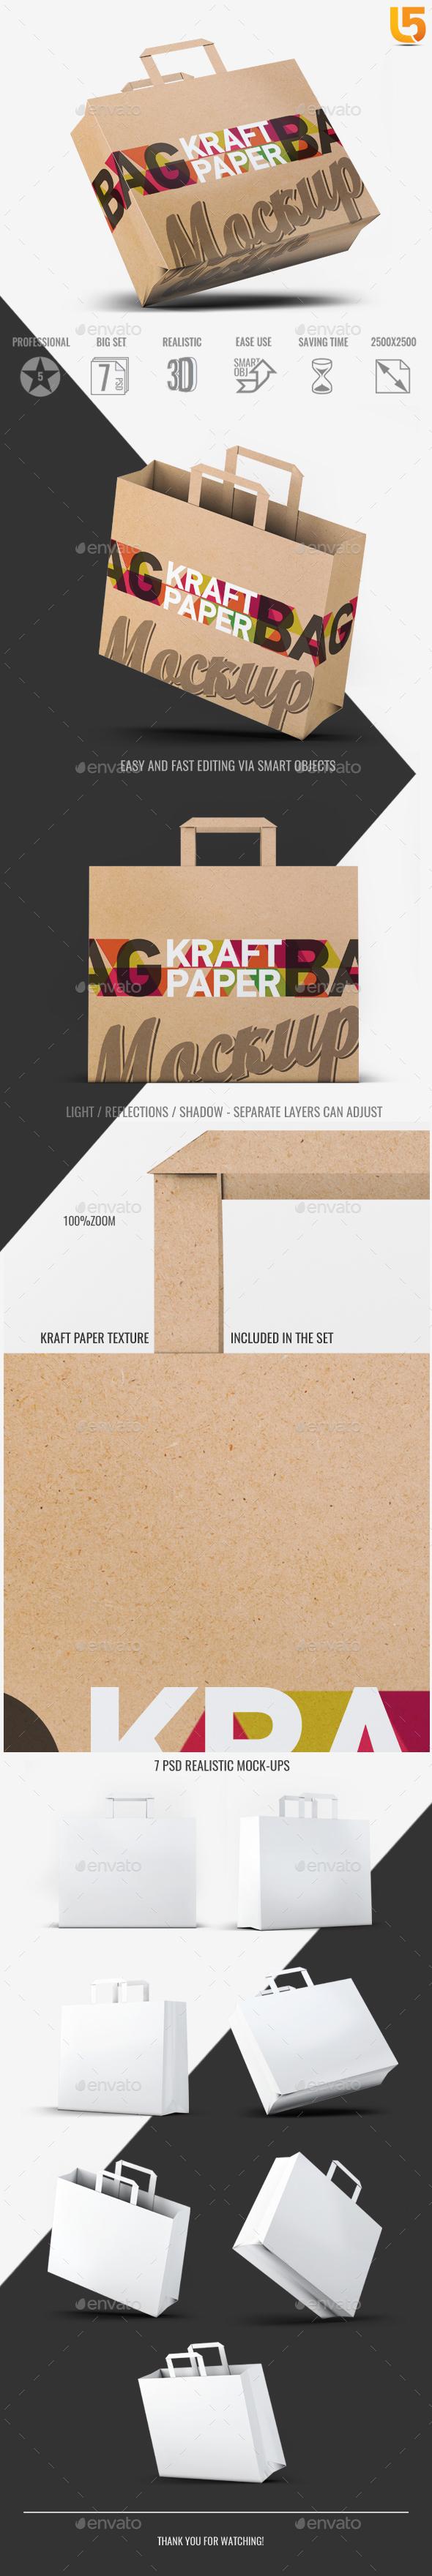 Kraft Paper Bag Mock-Up - Miscellaneous Print